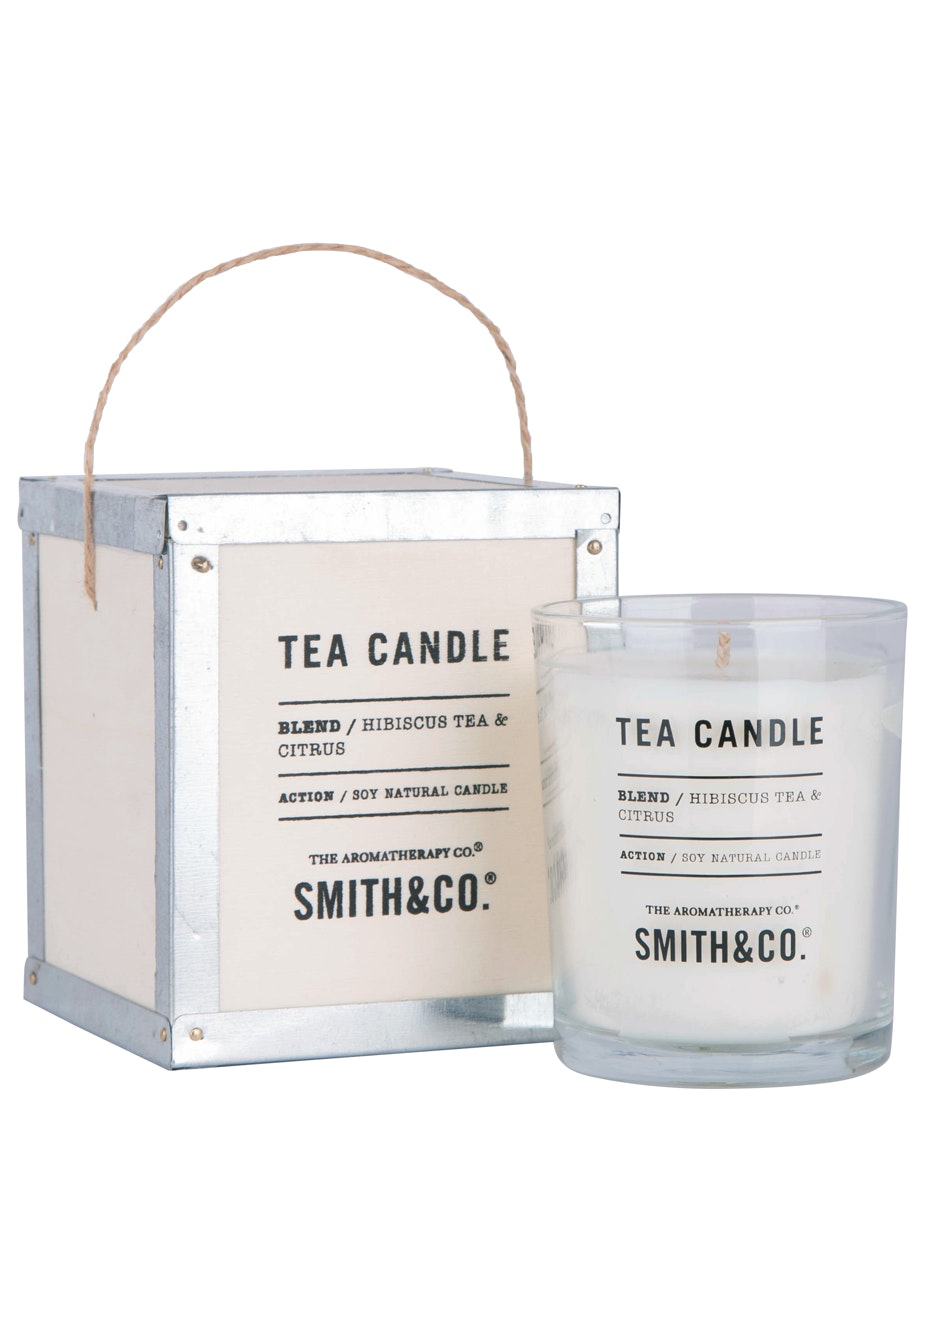 The Aromatherapy Co. Tea Chest Candle  - Hibiscus Tea & Citrus